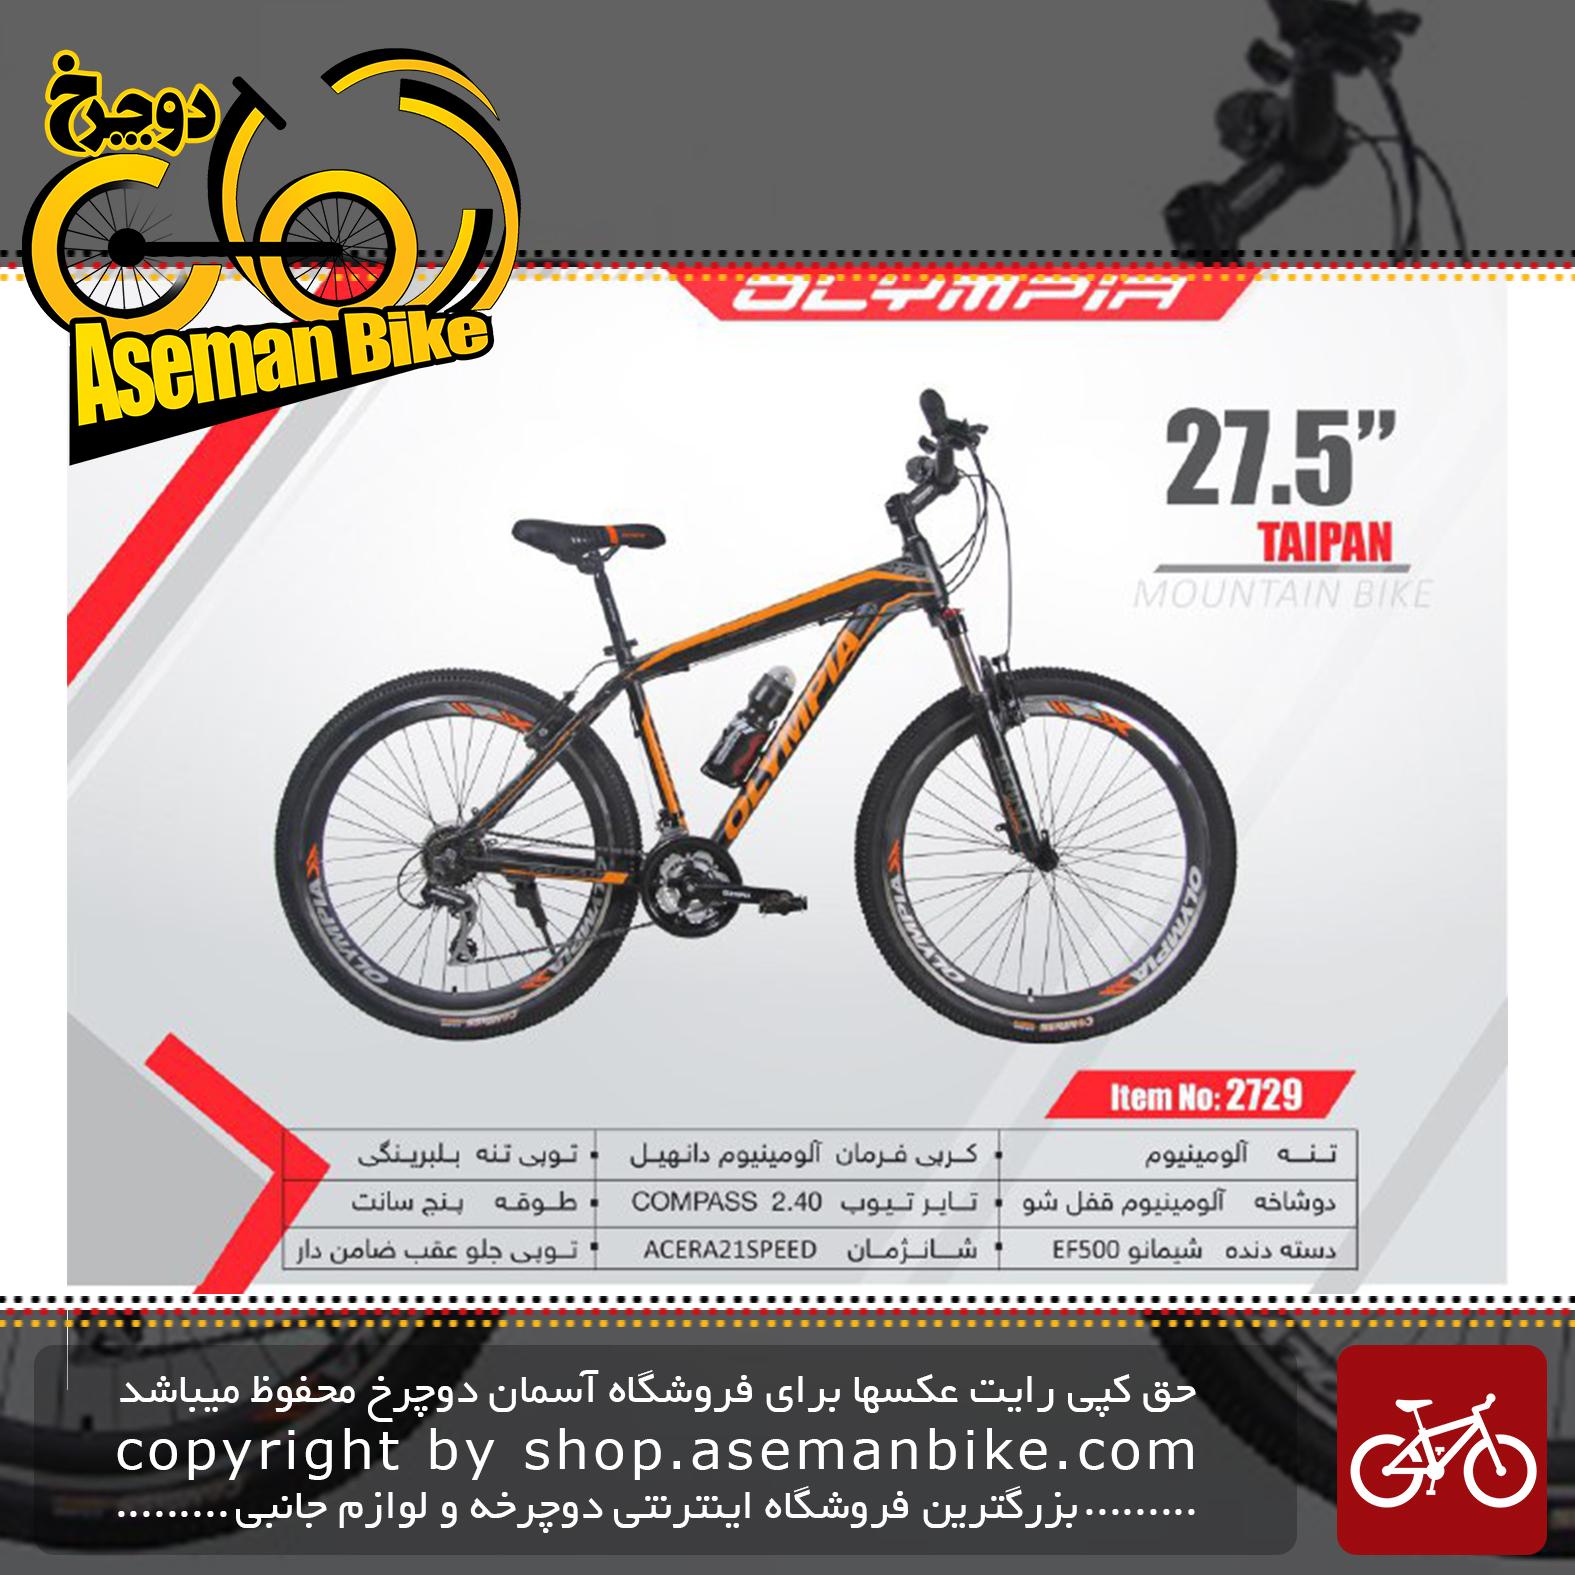 دوچرخه کوهستان المپیا سایز 27.5 مدل تایپان OLYMPIA SIZE 27.5 TAIPAN